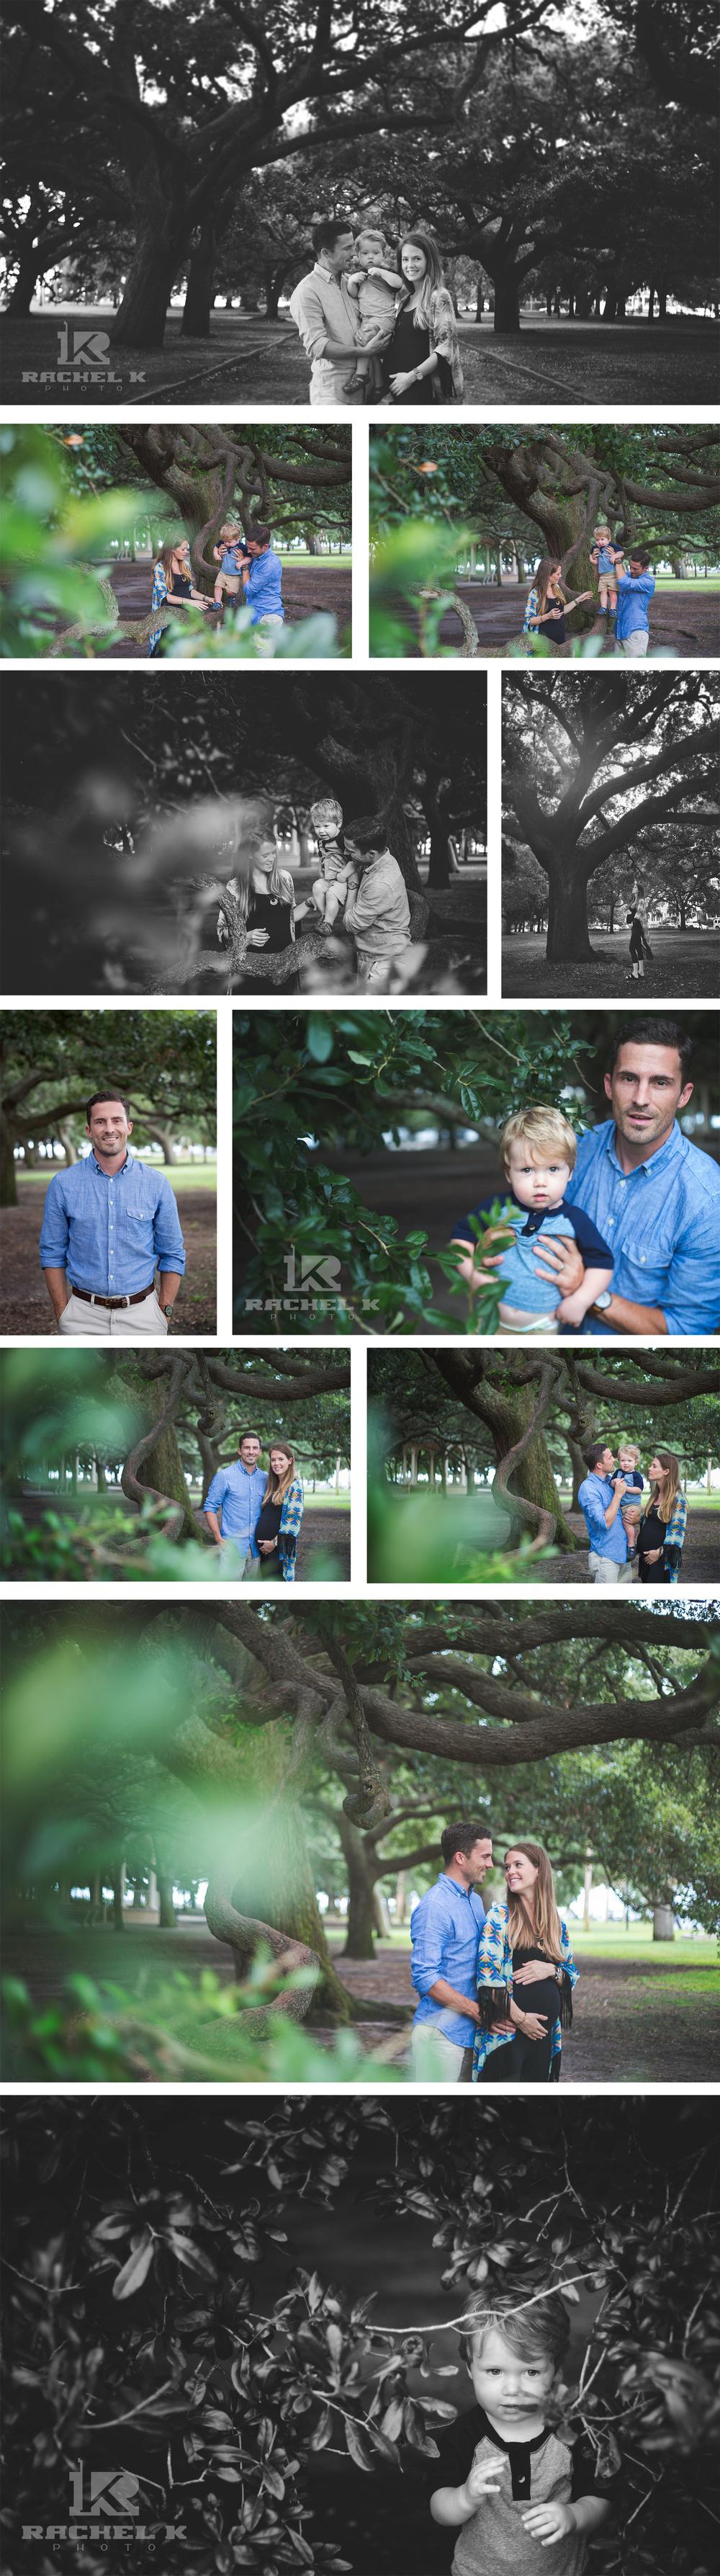 Rachel K Photo maternity session in Charleston